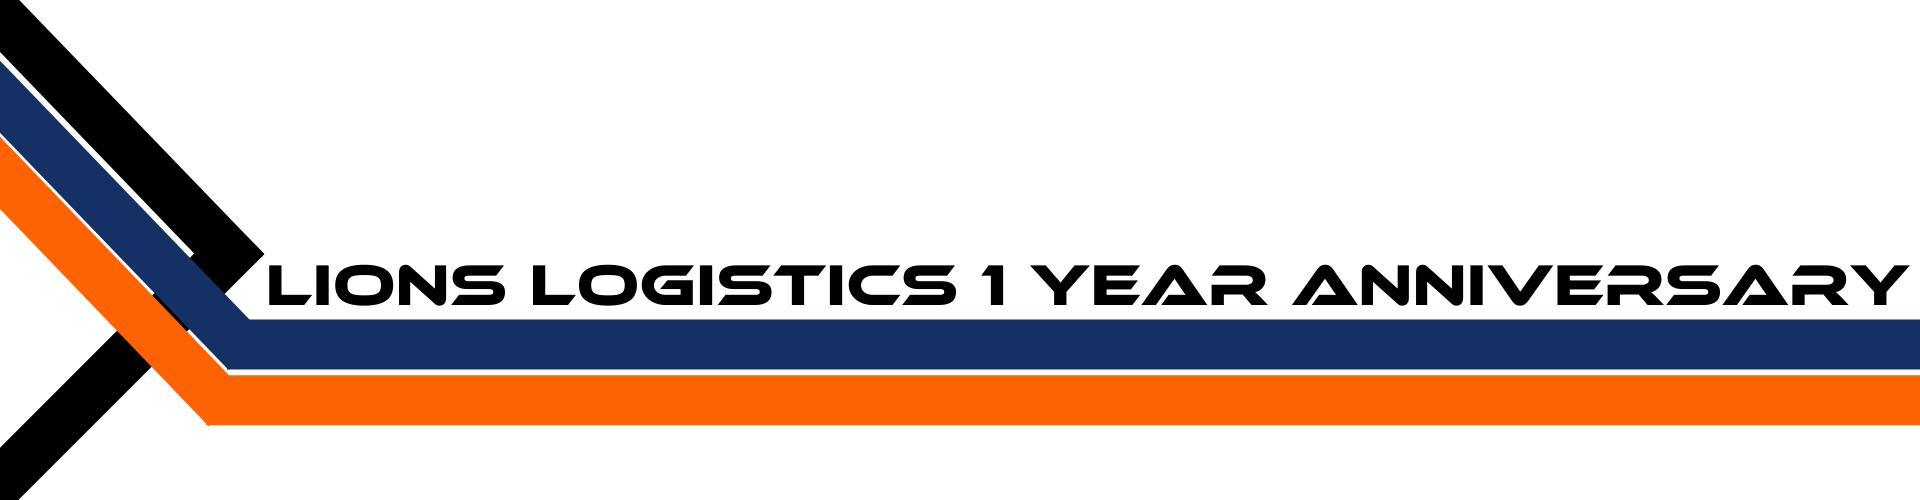 Lions Logistics UK 1 Year Anniversary Convoy